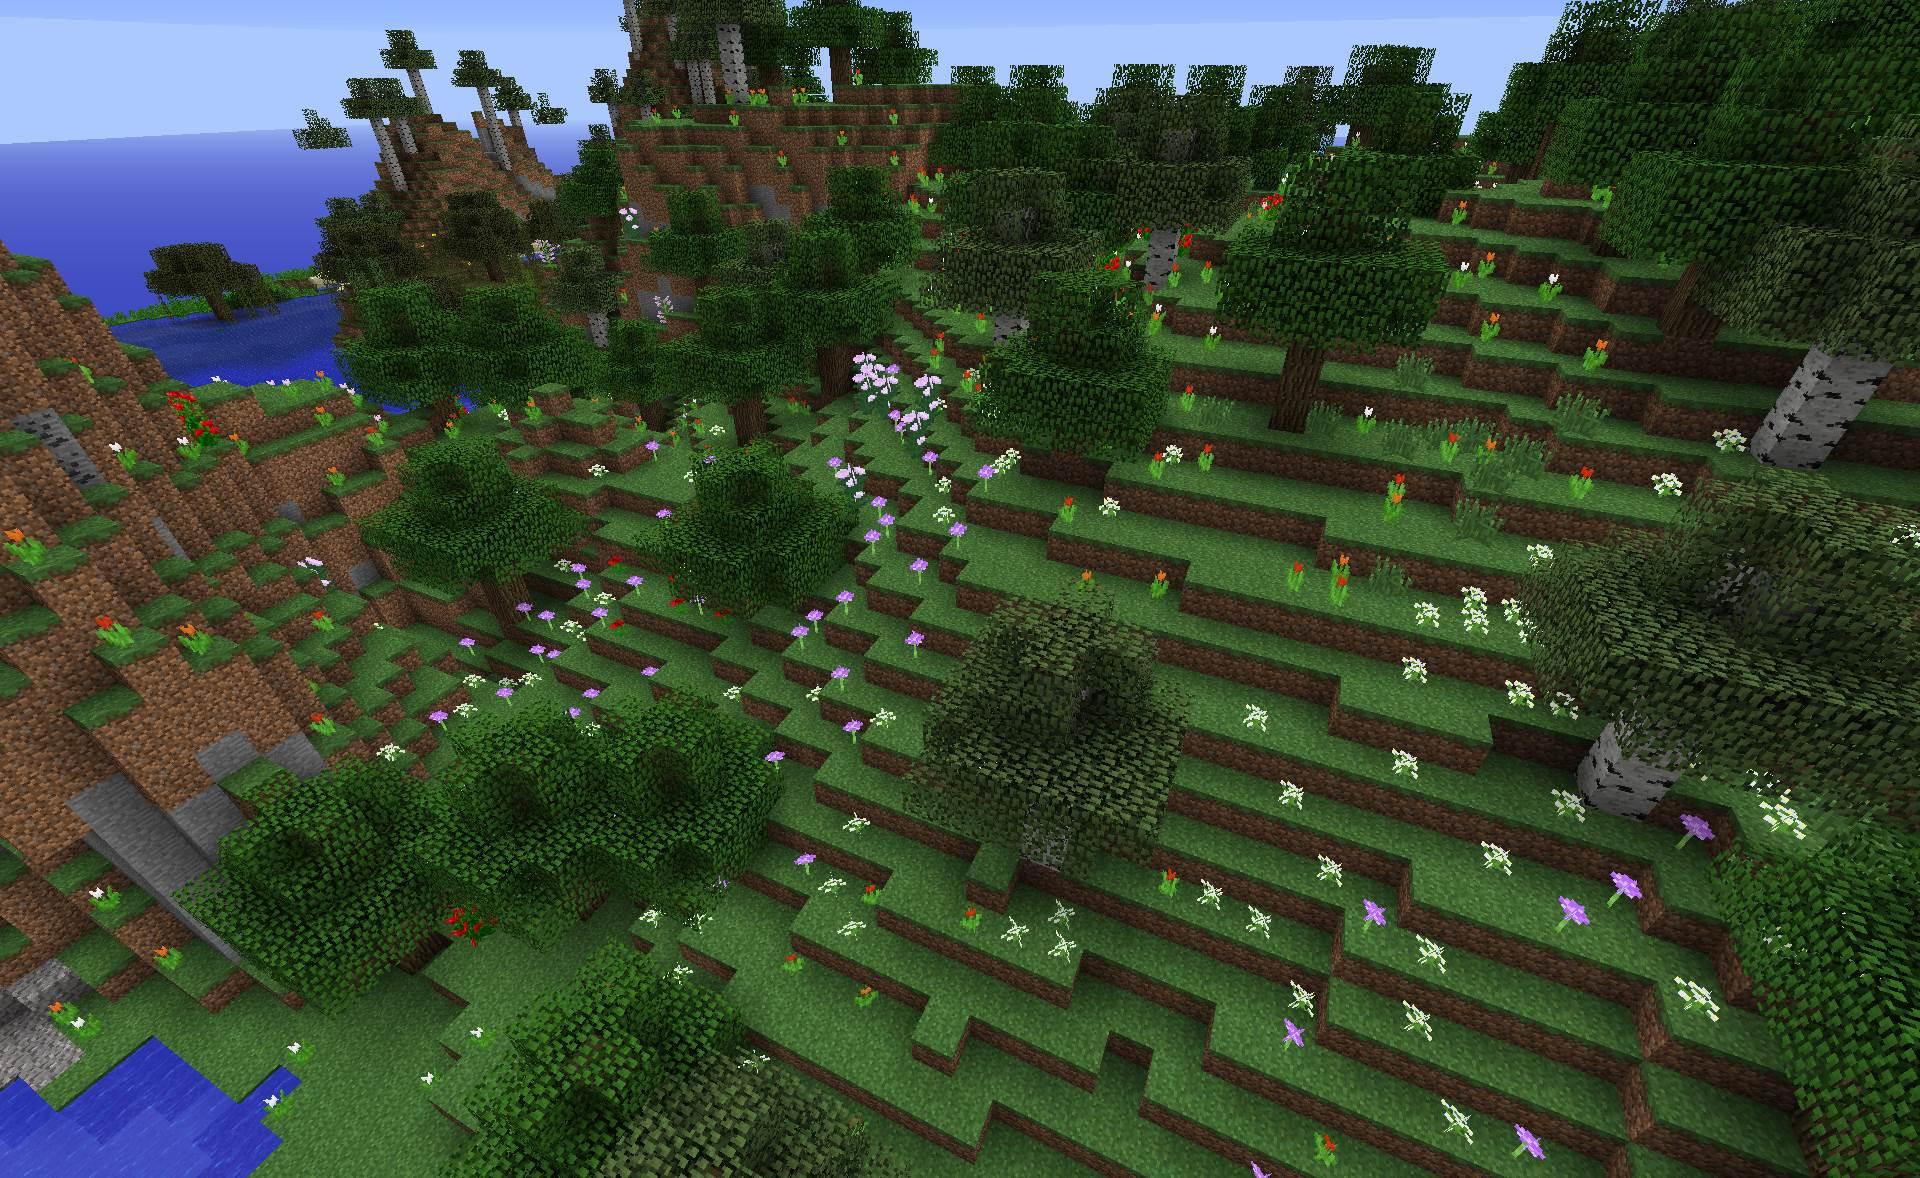 1 7 Horrid World Generation Recent Updates and Snapshots Minecraft Discus